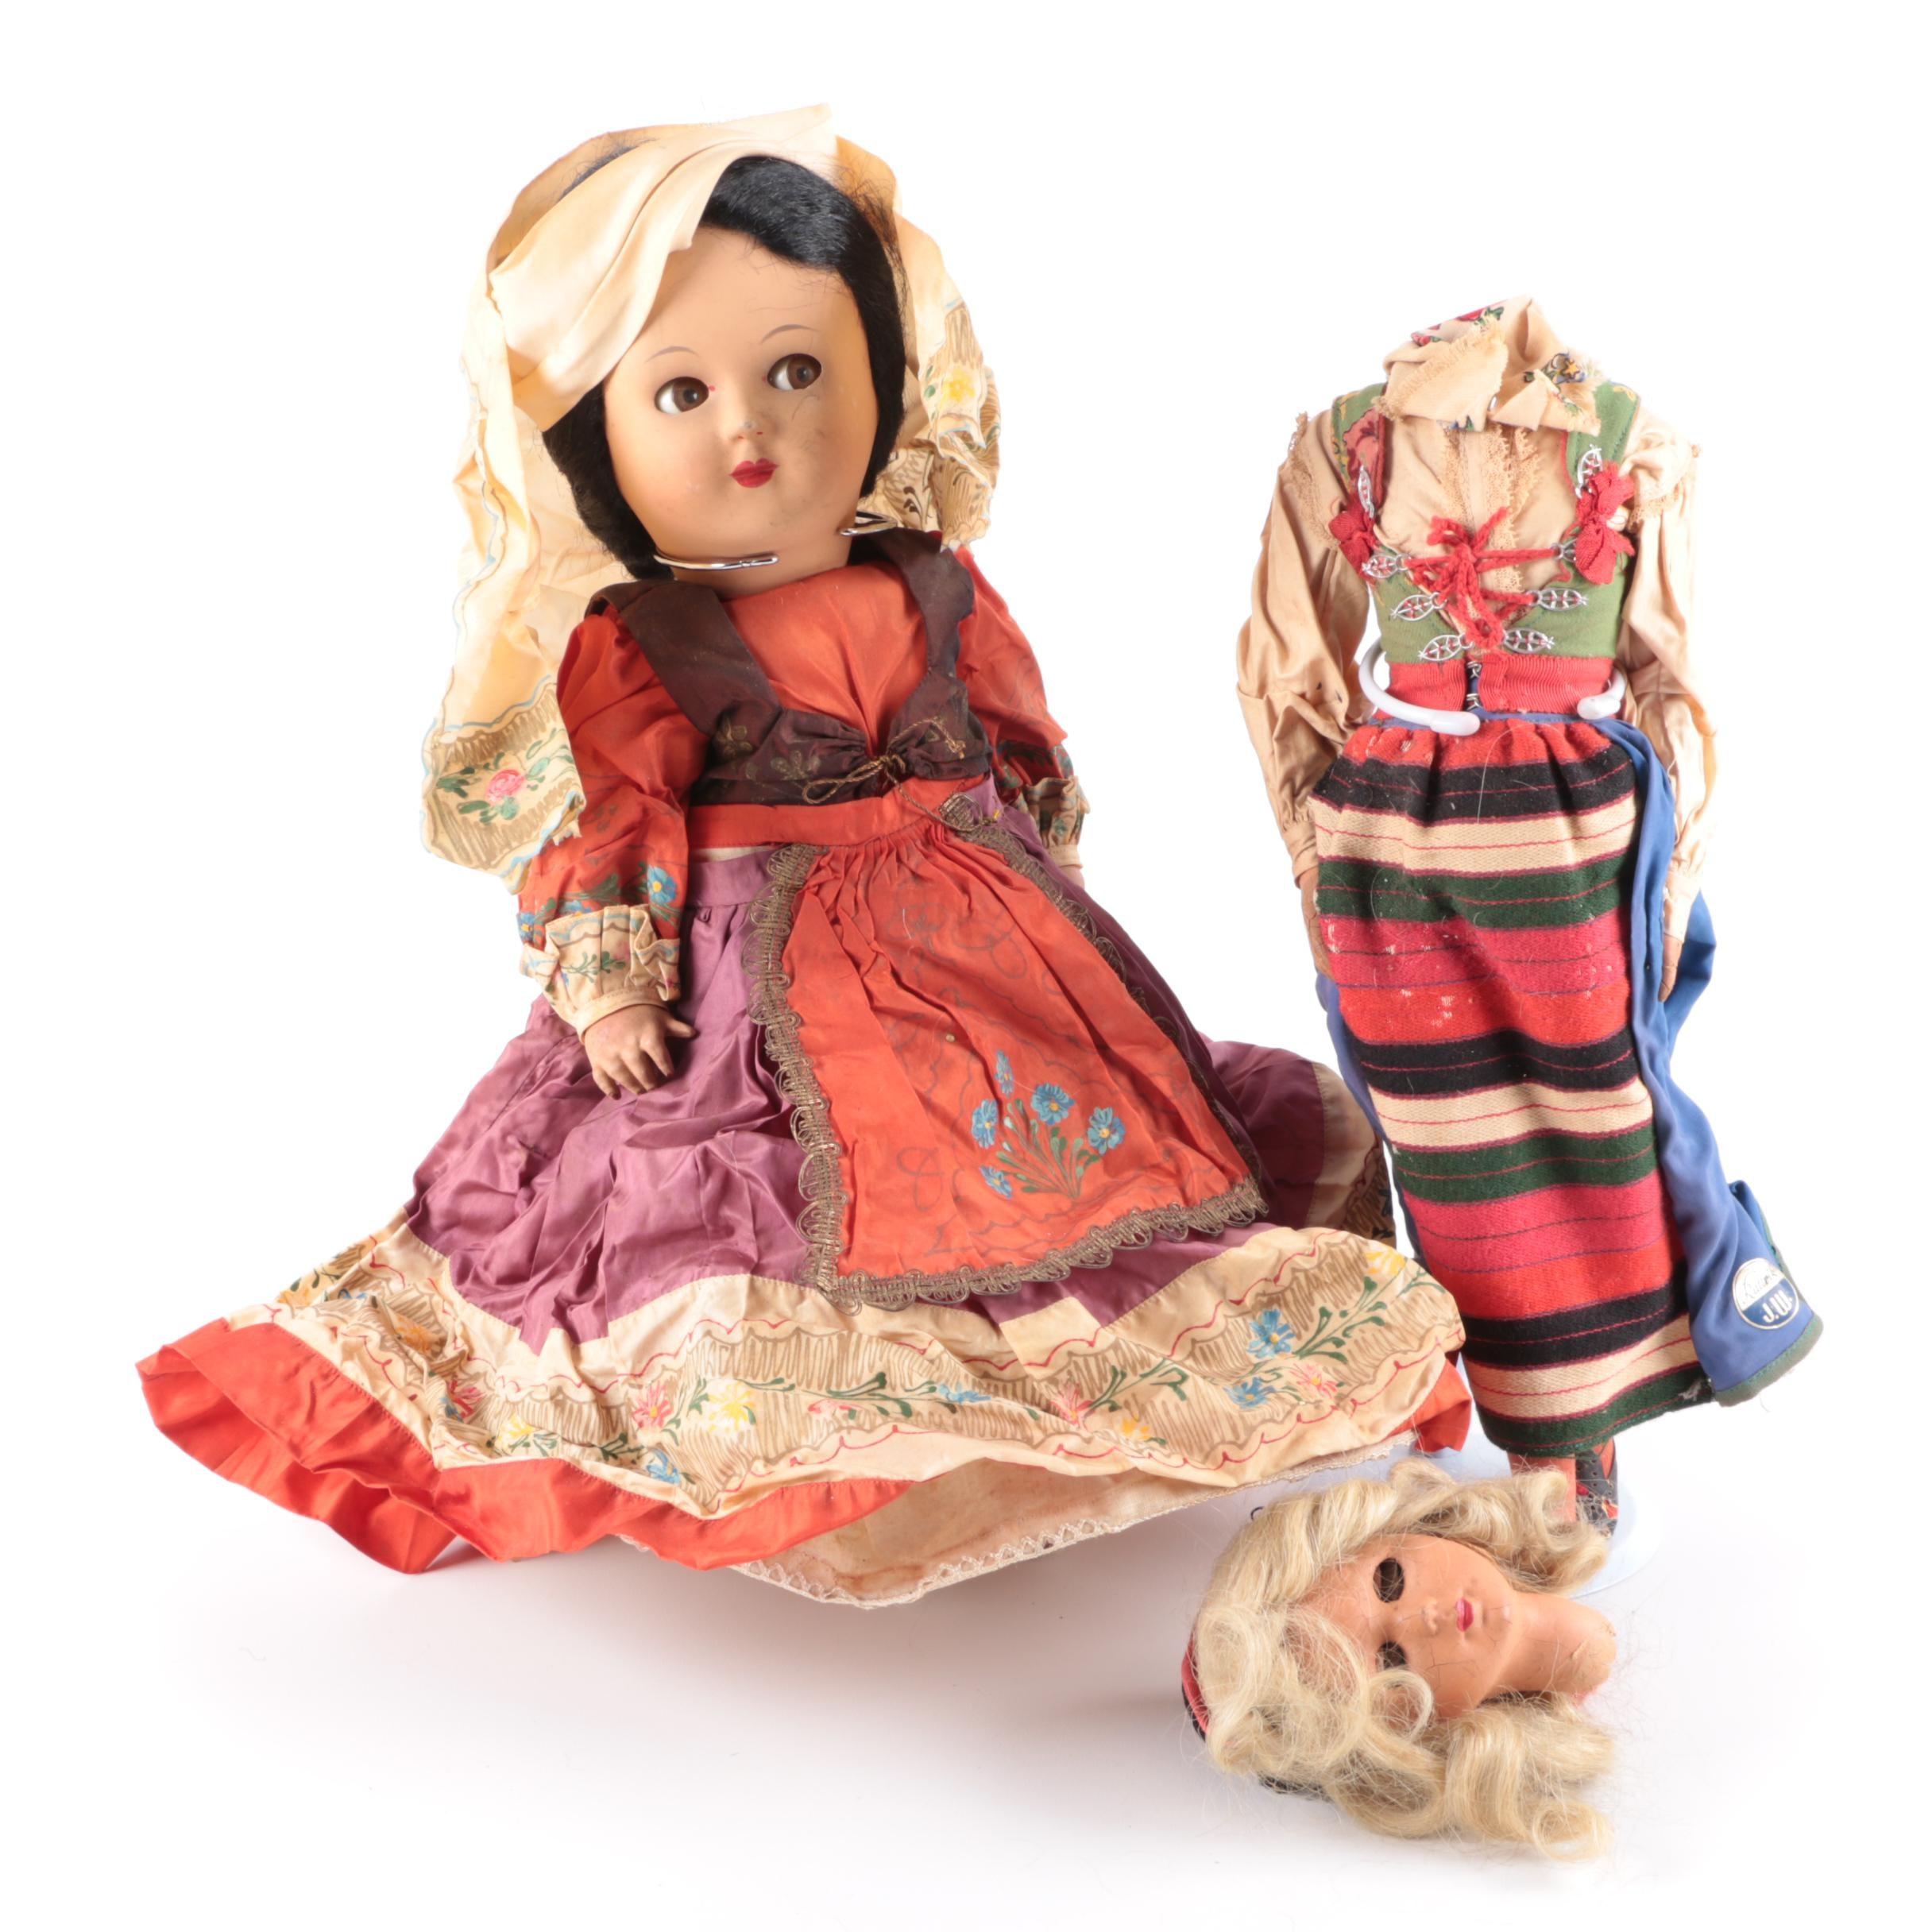 Vintage Rättvik J.W. Swedish and Italian Style Souvenir Dolls